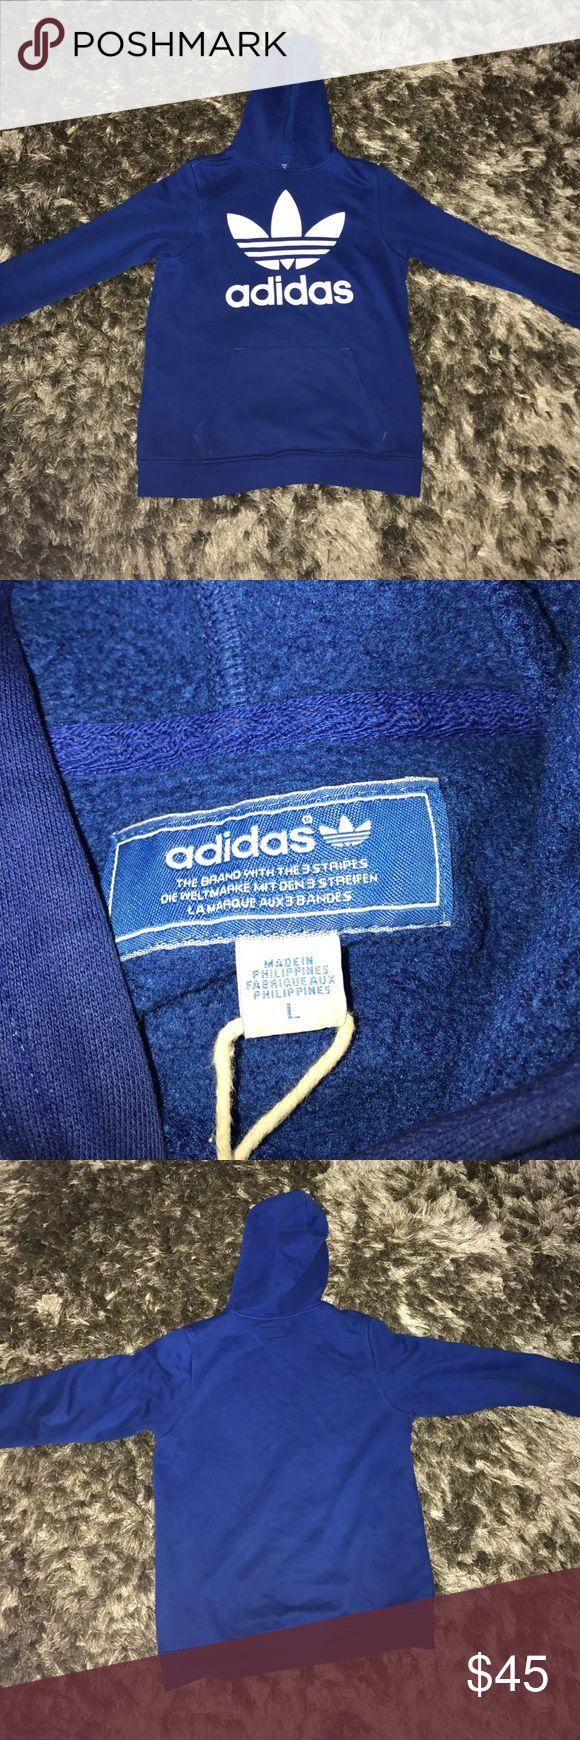 Addidas hoodie Nice blue and white hoodie from adidas adidas Shirts & Tops Sweatshirts & Hoodies